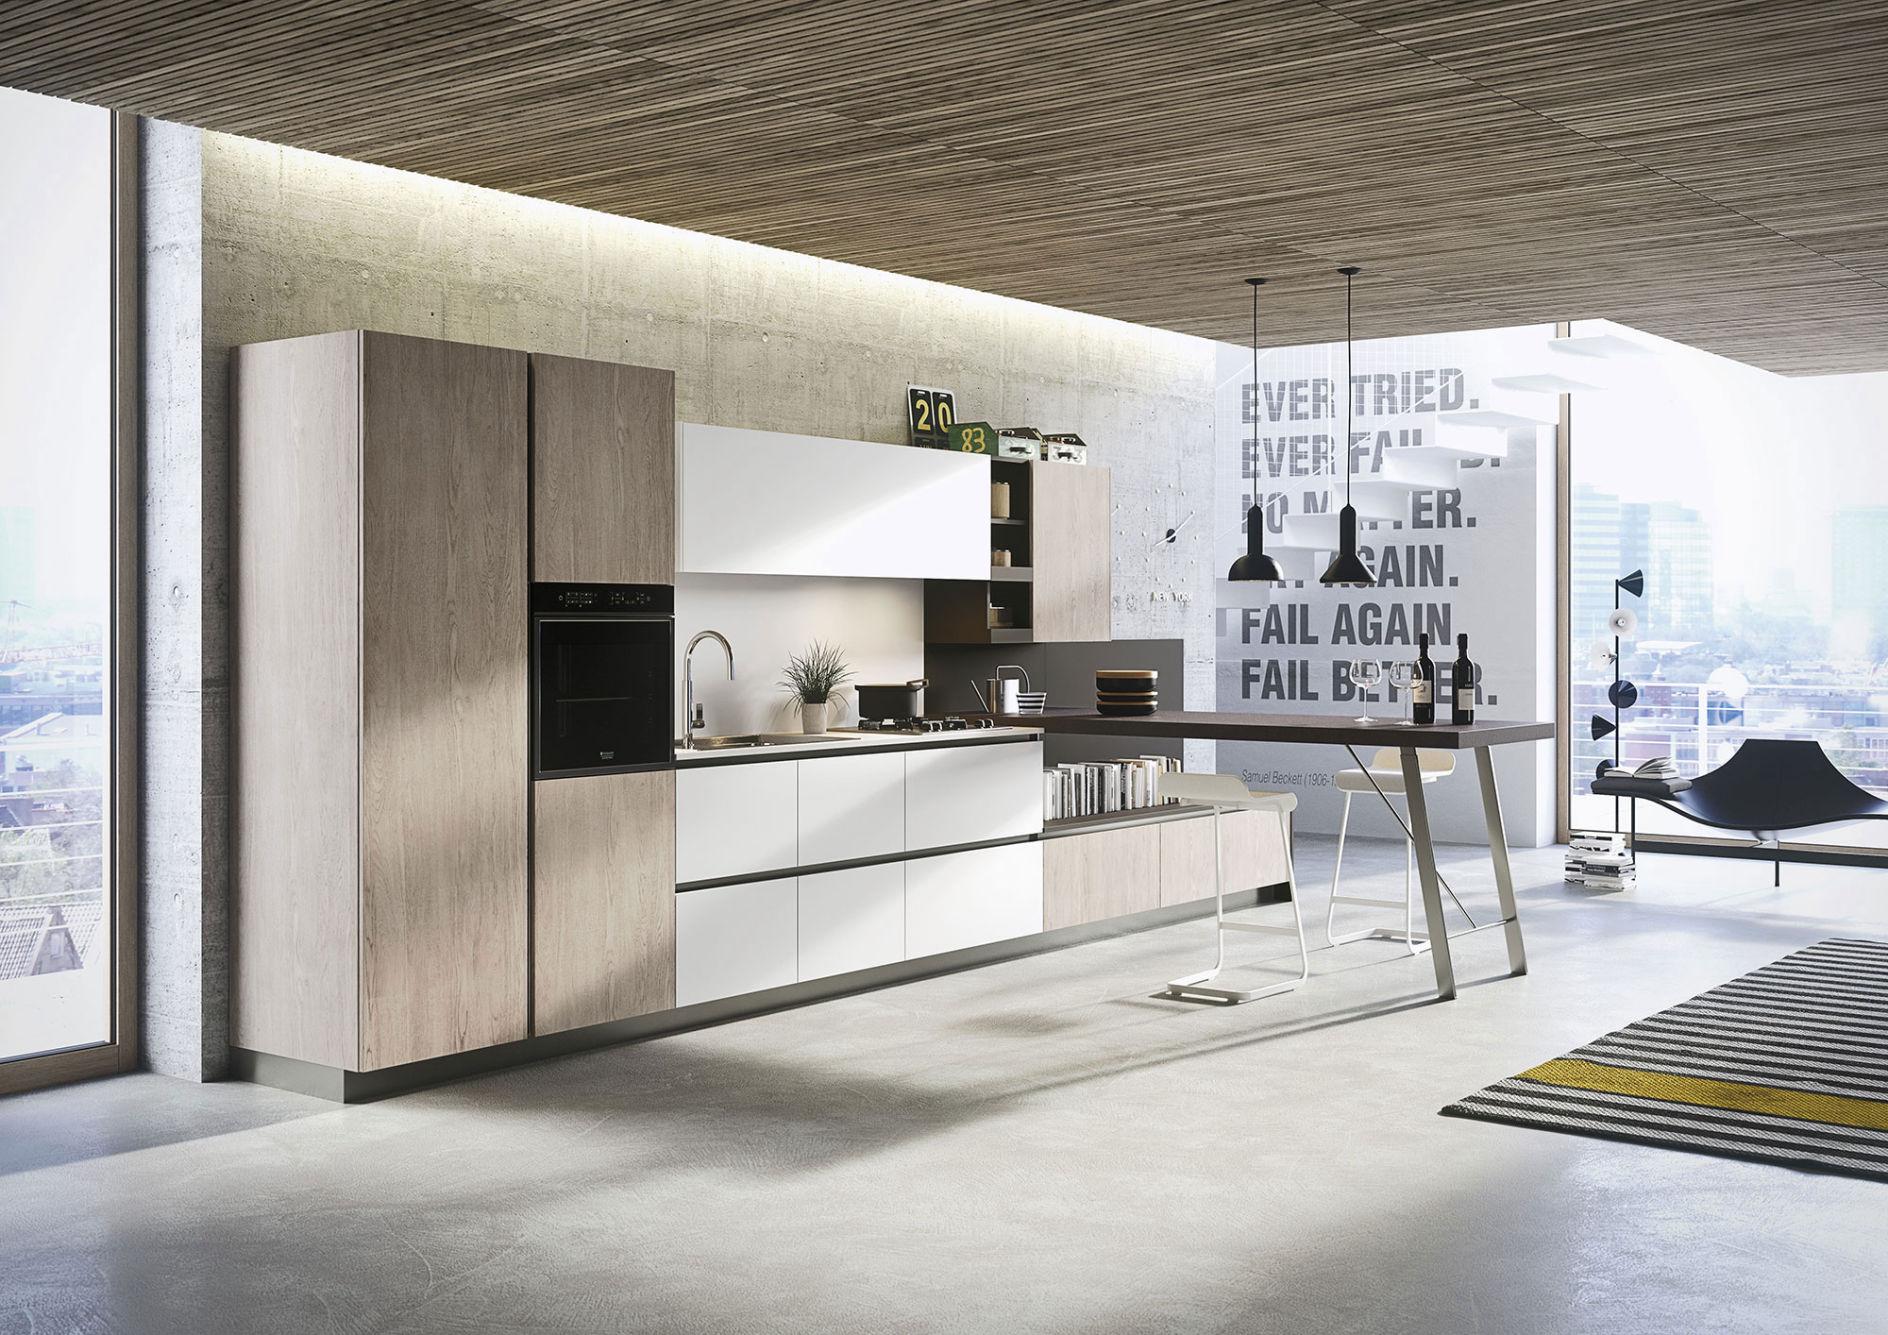 Cuisine Moderne Design Italienne.Installateur Cuisine Snaidero Design A Toulon Var